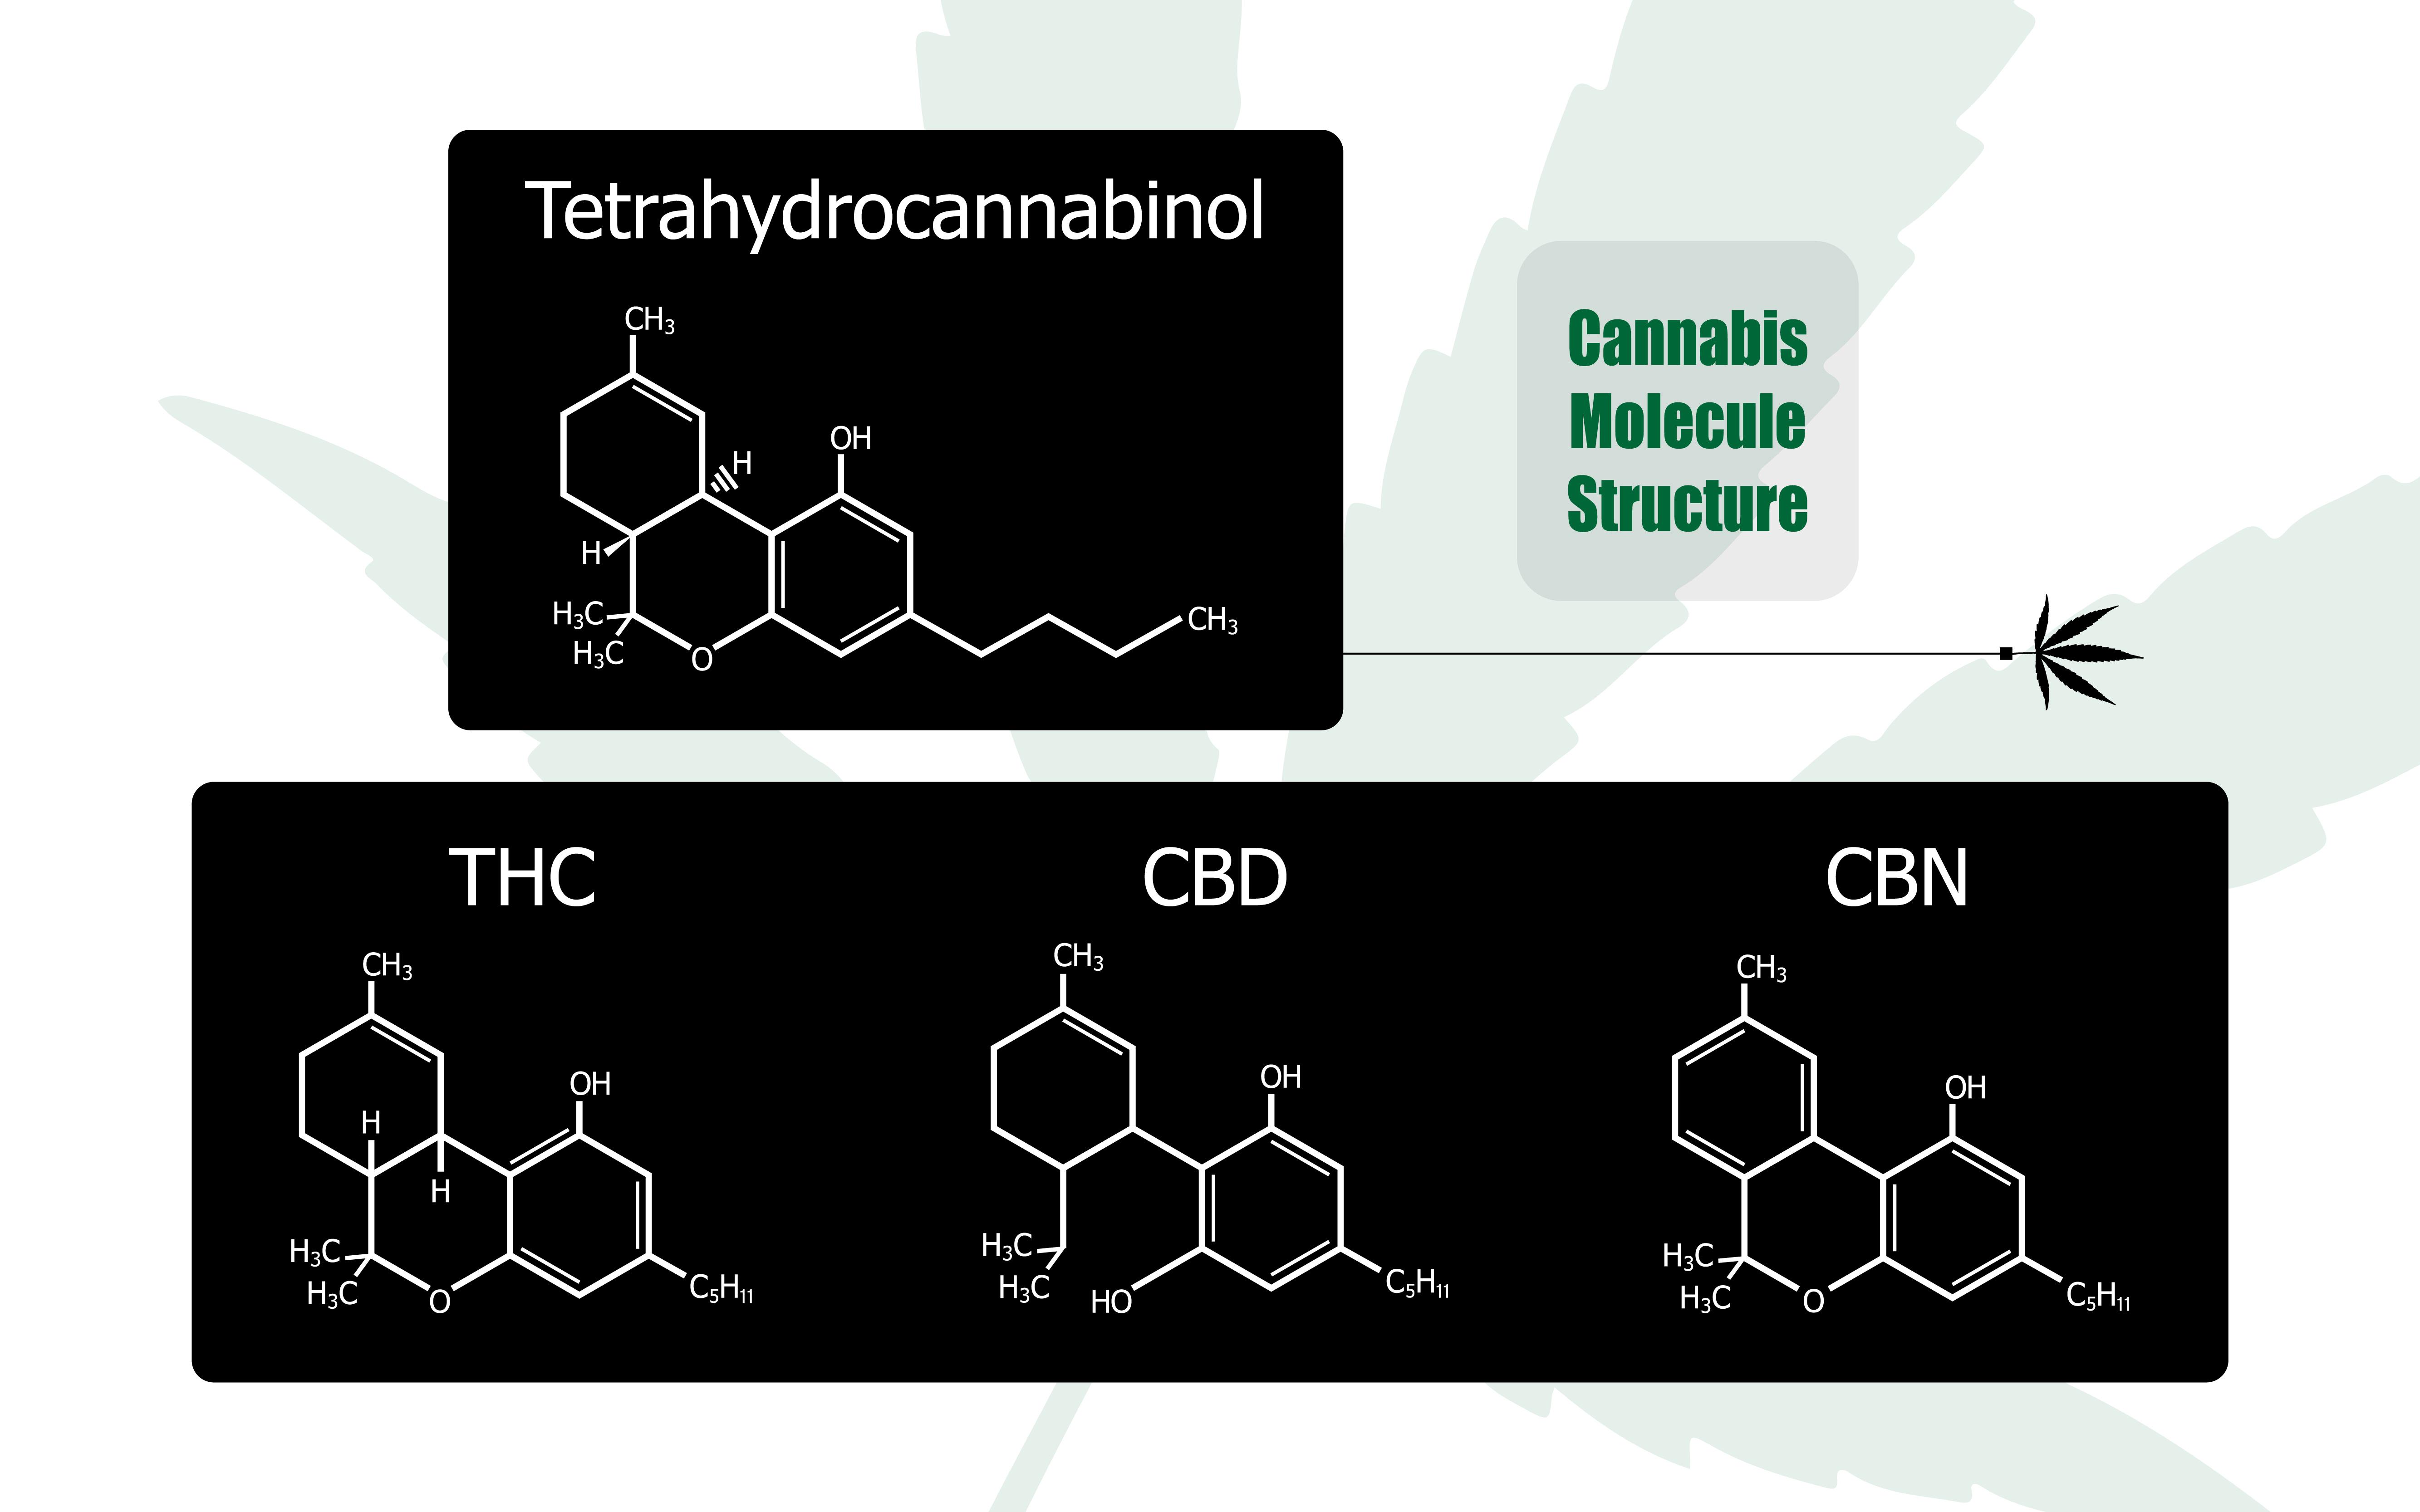 CBD THC efecto entourage counterbones symbiosis sistema inmune psyche cannabis marihuana medicinal cannabinoid endocannabinoid modulate